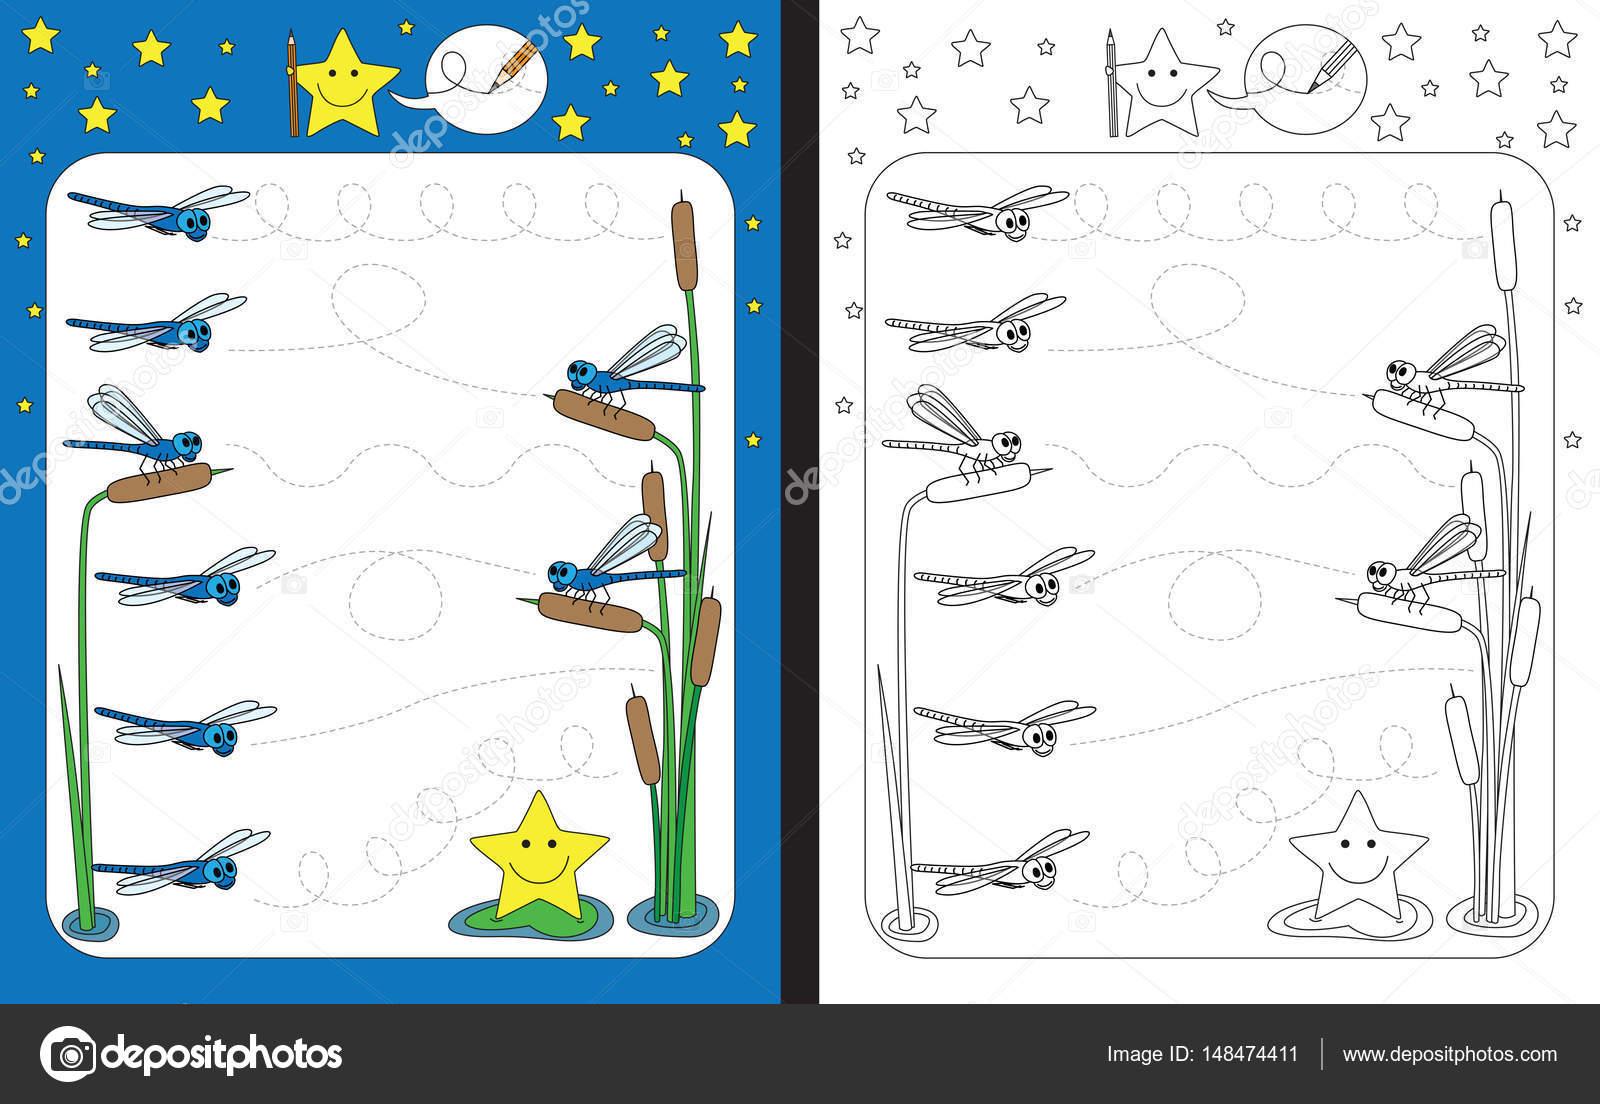 Illustrierte Vorschule Arbeitsblatt — Stockvektor © nahhan #148474411